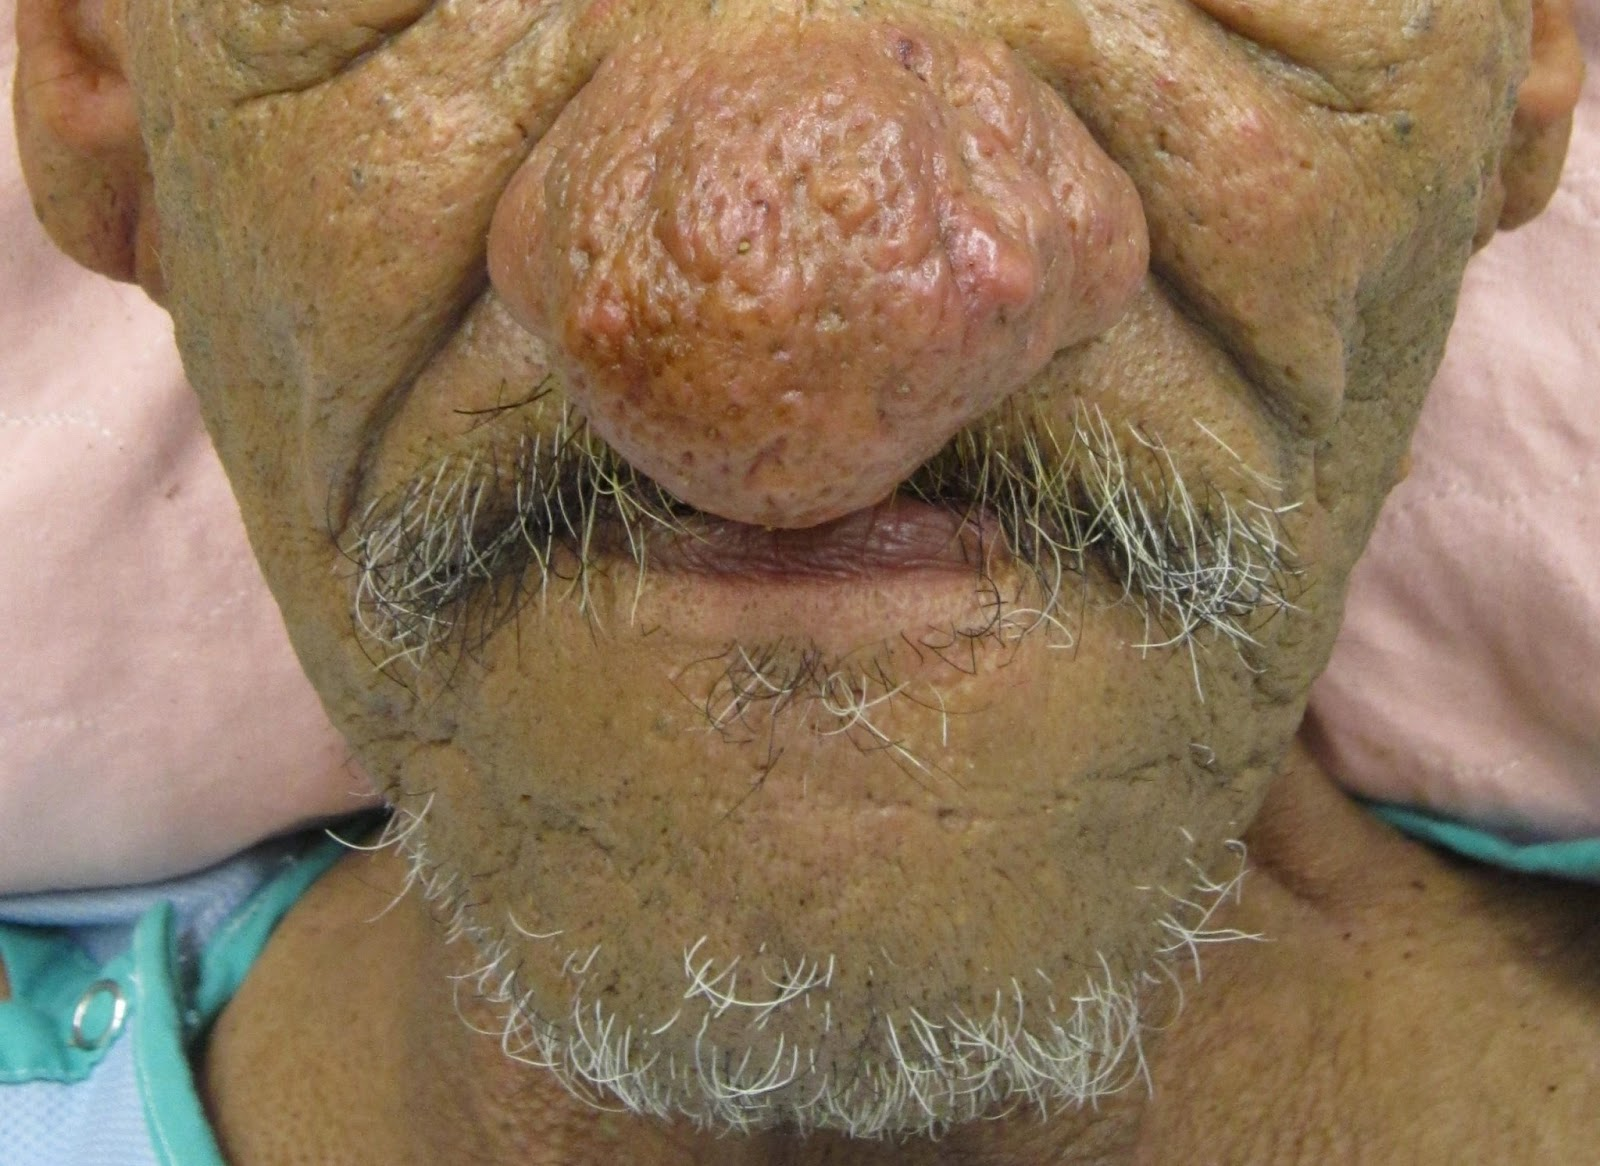 rhinophyma causes